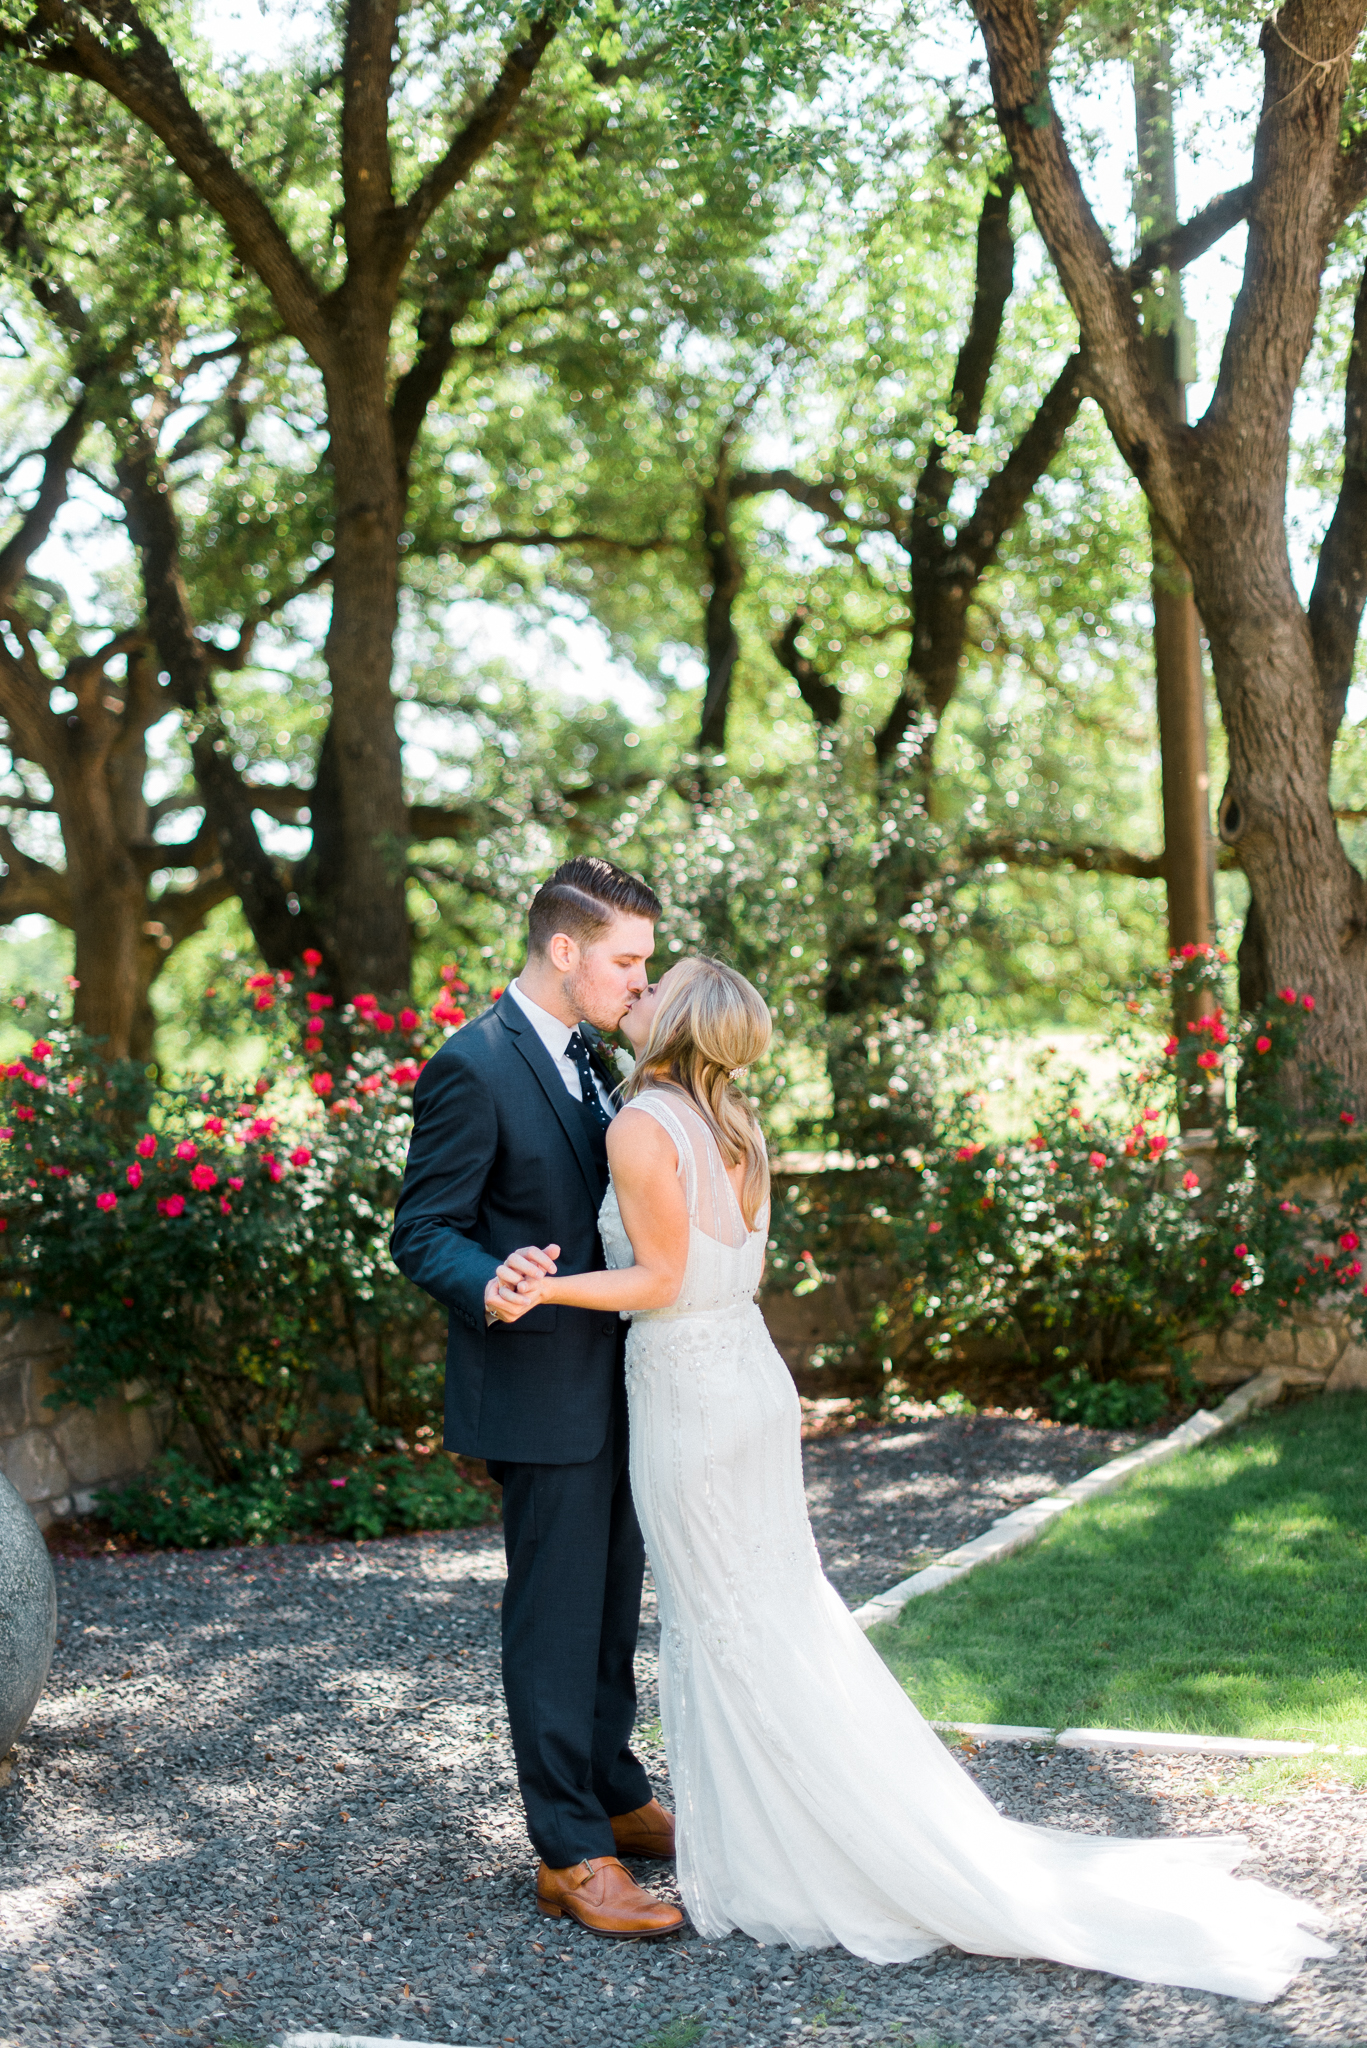 Austin_Fine _Art_Wedding_Photographer_ Justin_Douglas_ First_Look_07.jpg